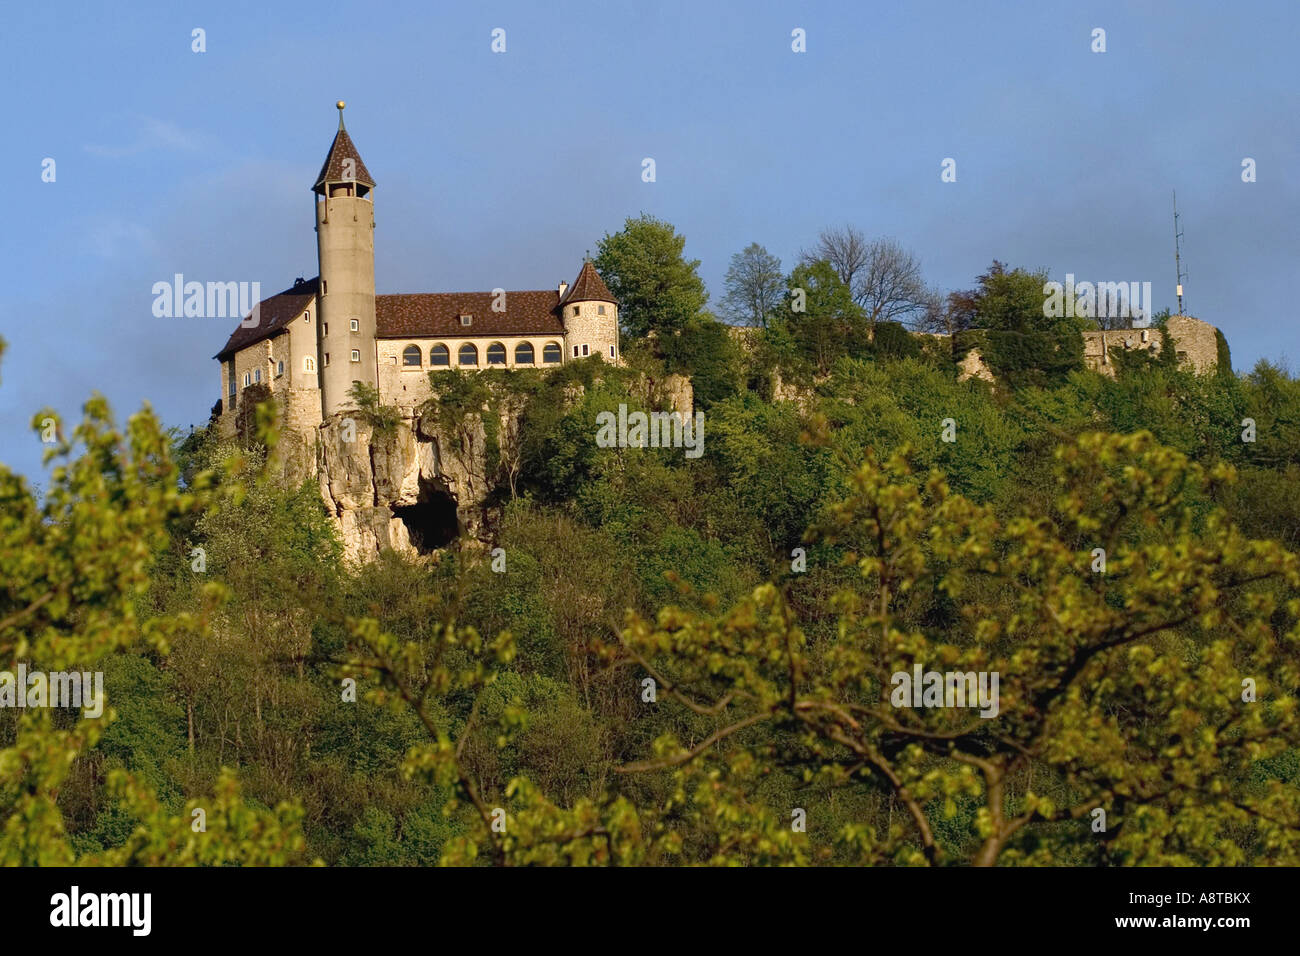 the castel Teck Kirchheim Unter Teck Germany BadenWuerttemberg Stock Photo Royalty Free